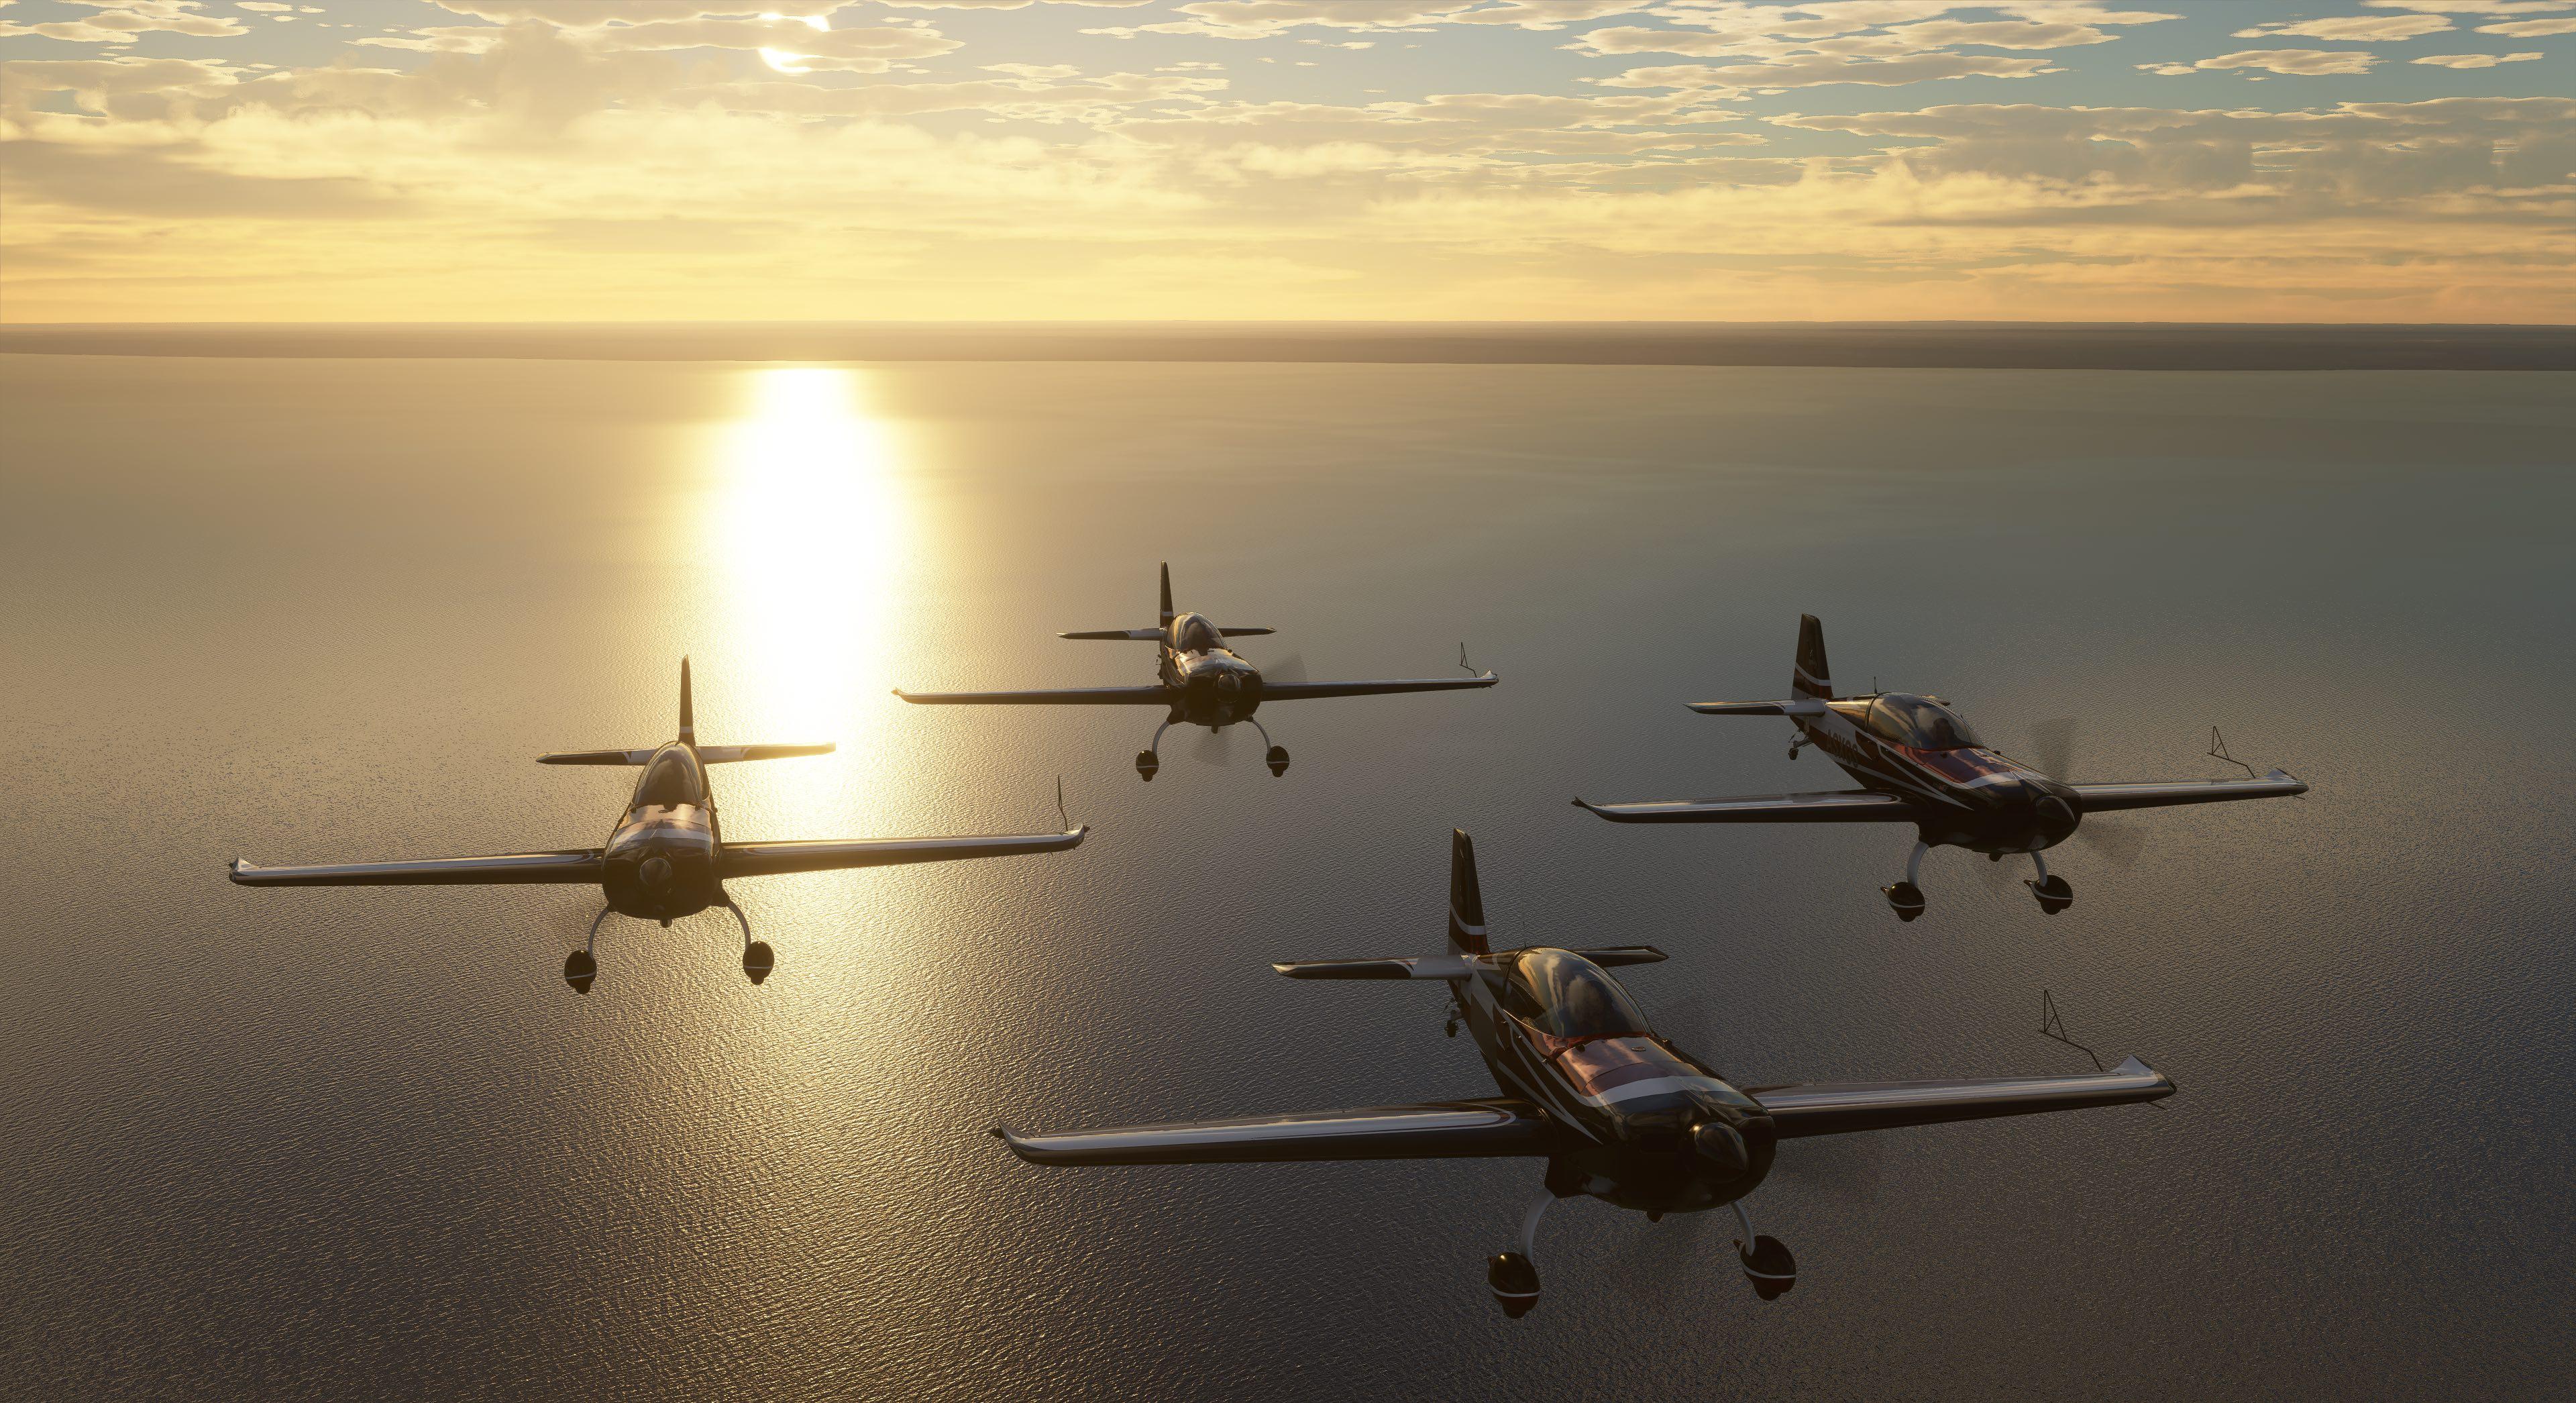 Pemandangan matahari terbenam di belakang empat pesawat dalam game Flight Simulator 2020